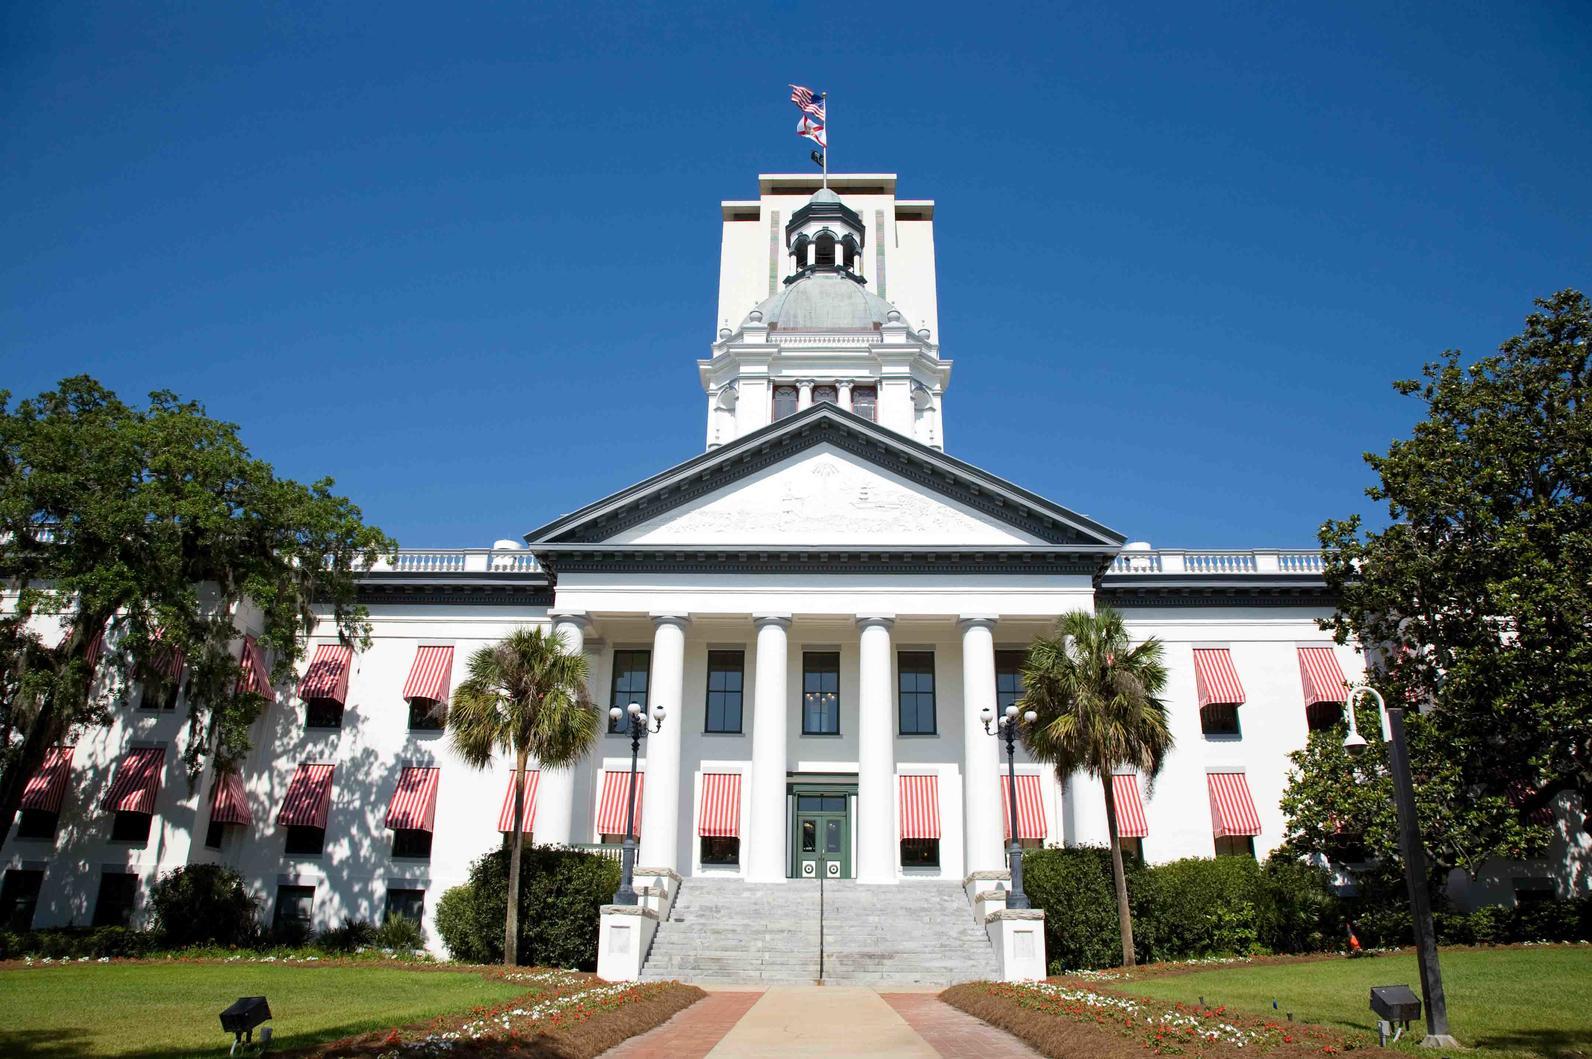 Florida's capitol building